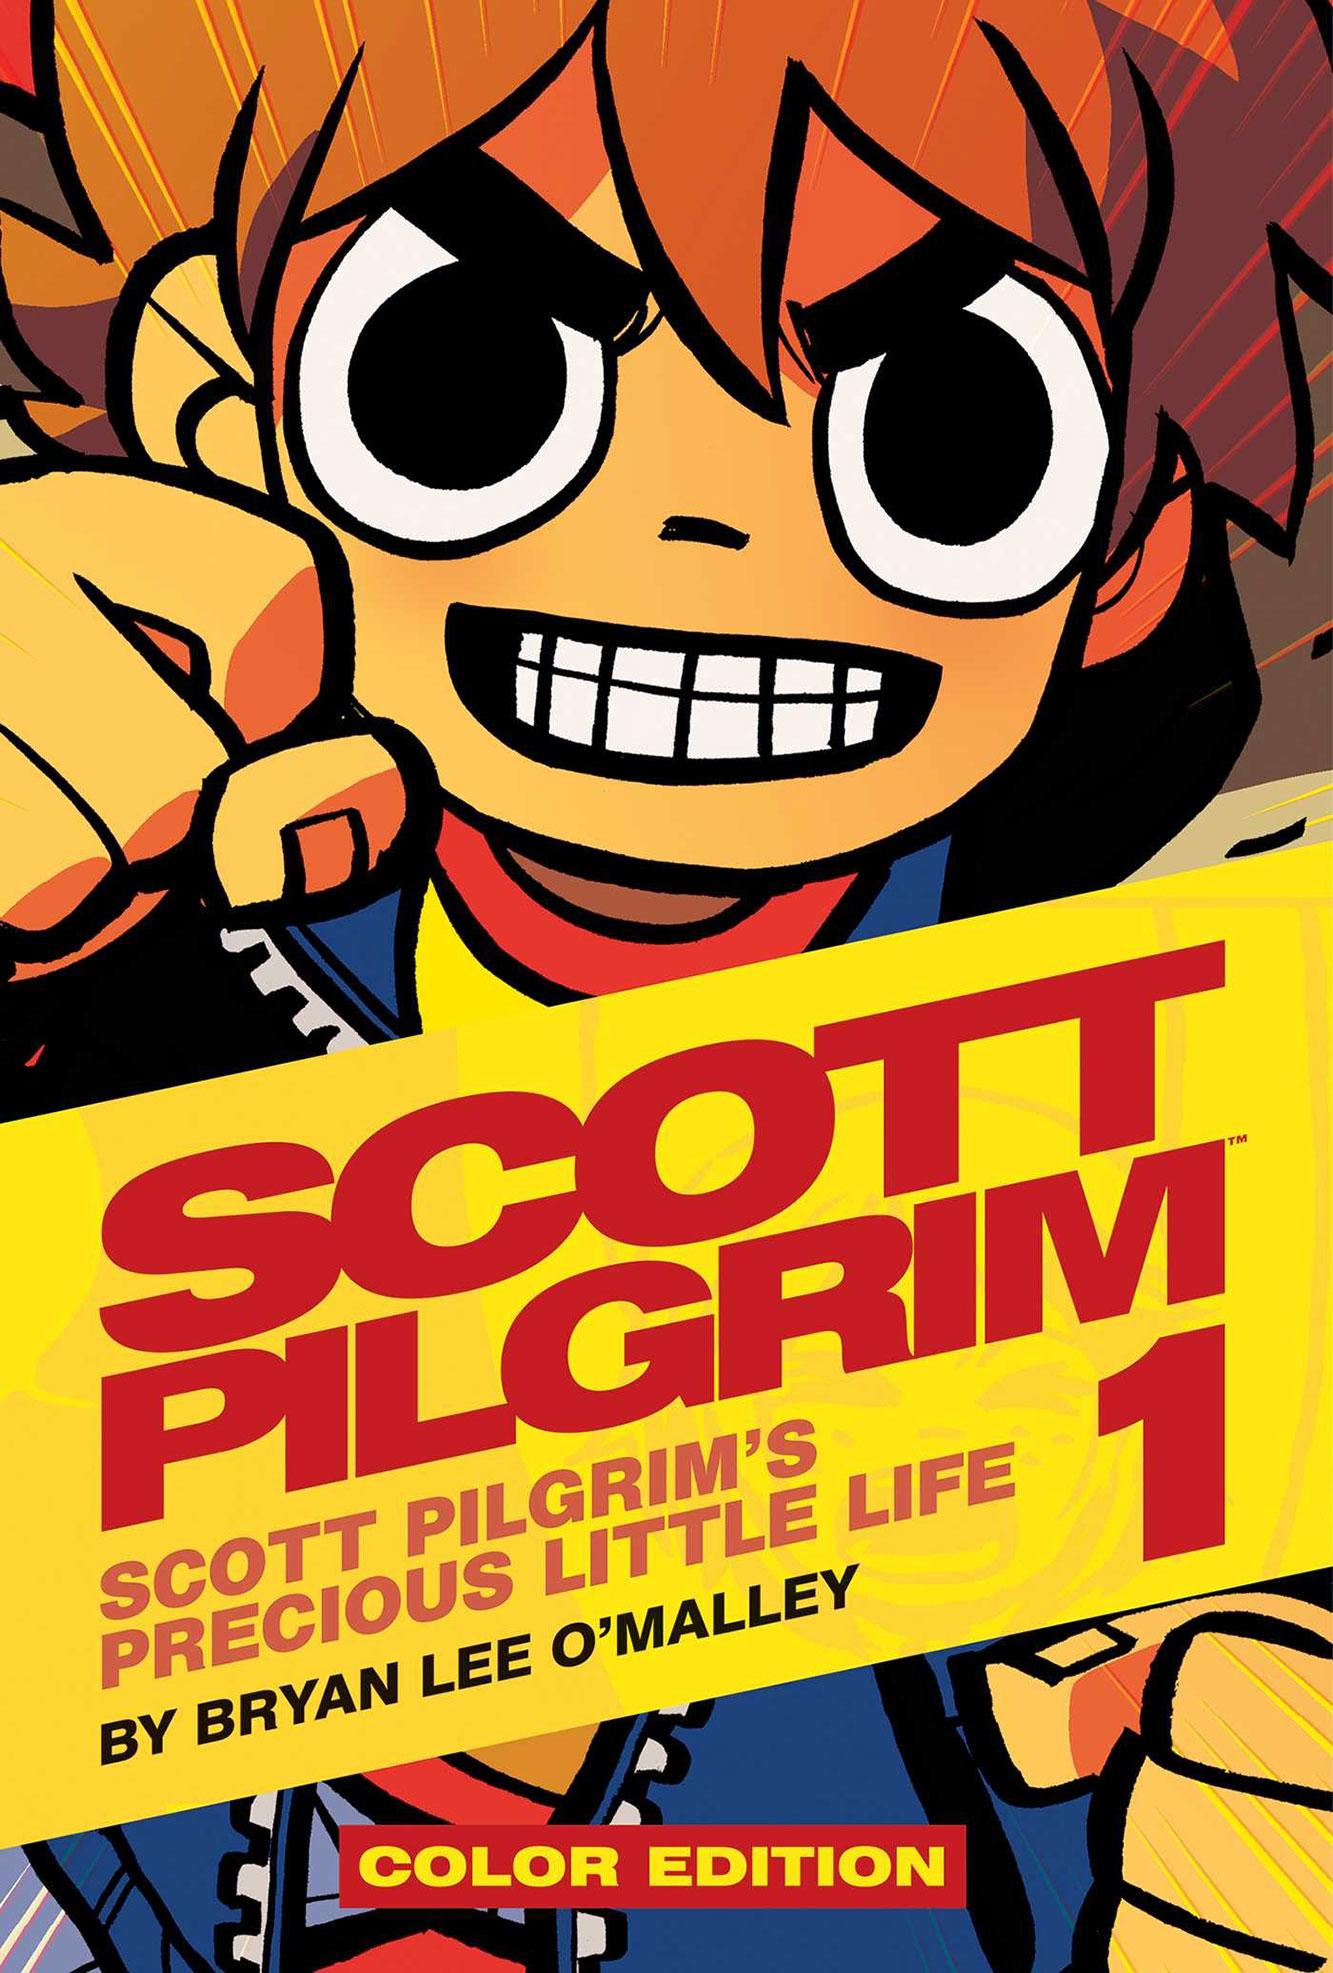 Scott Pilgrim Vol. 1: Precious Little Life by Bryan Lee O'Malley